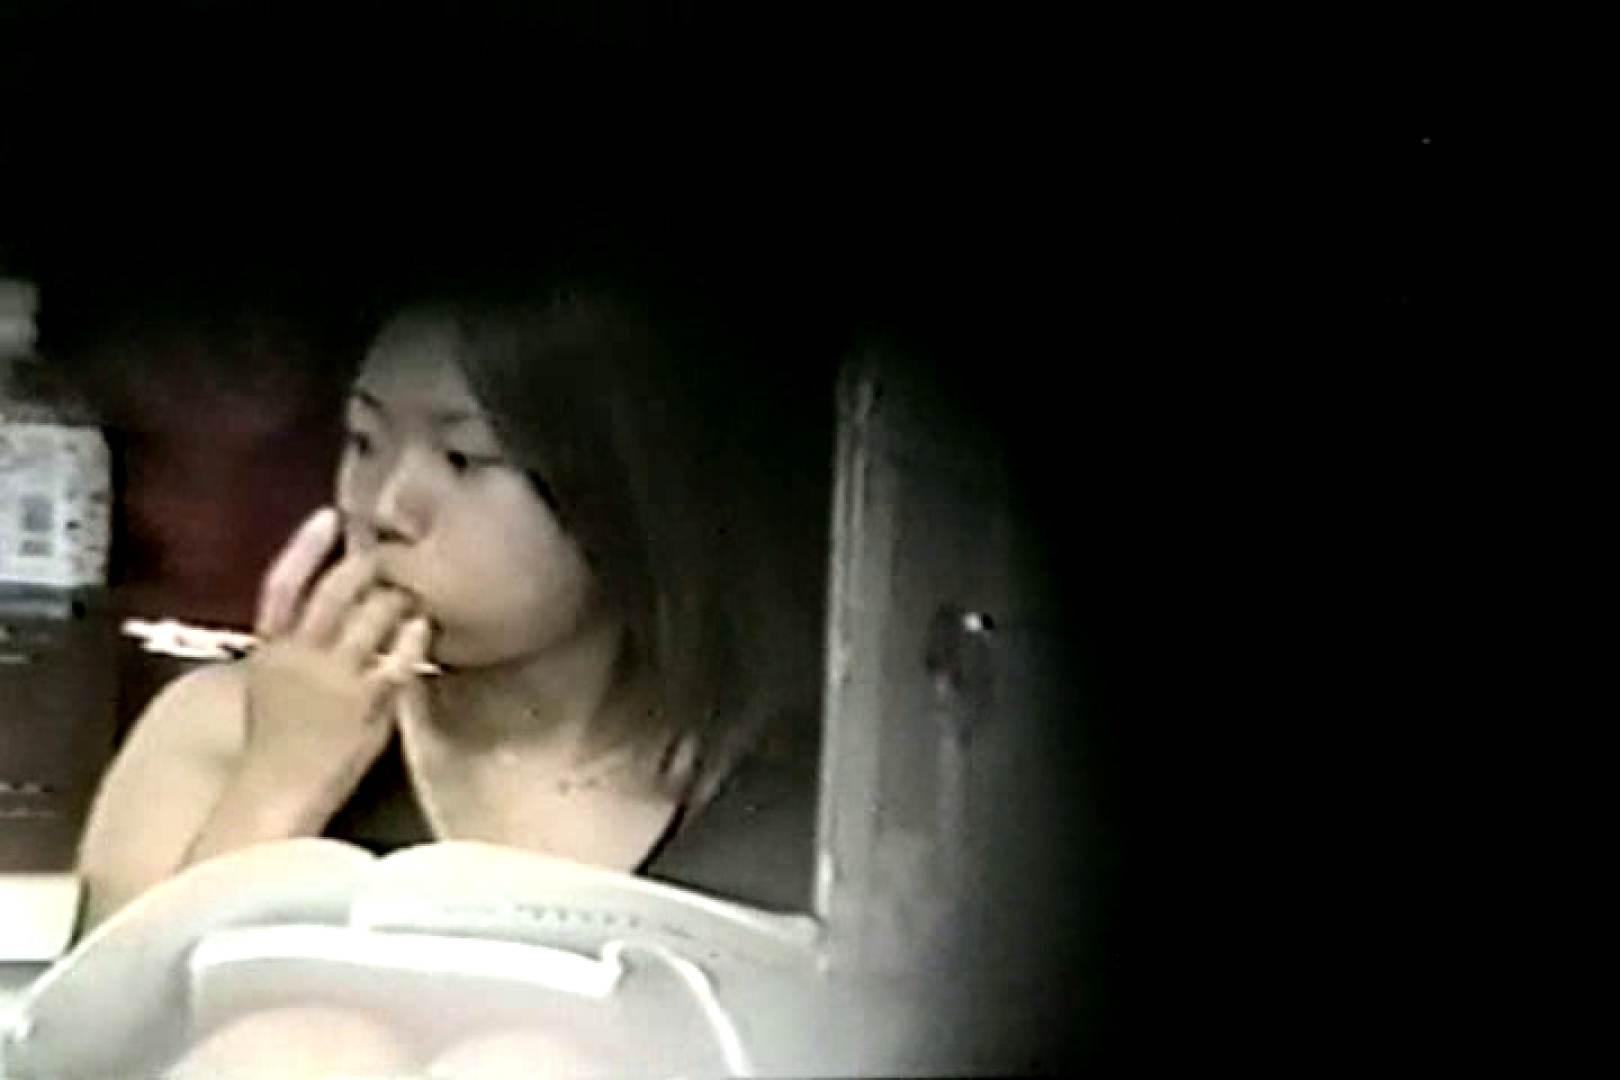 深夜の撮影会Vol.6 美女OL 戯れ無修正画像 24連発 22